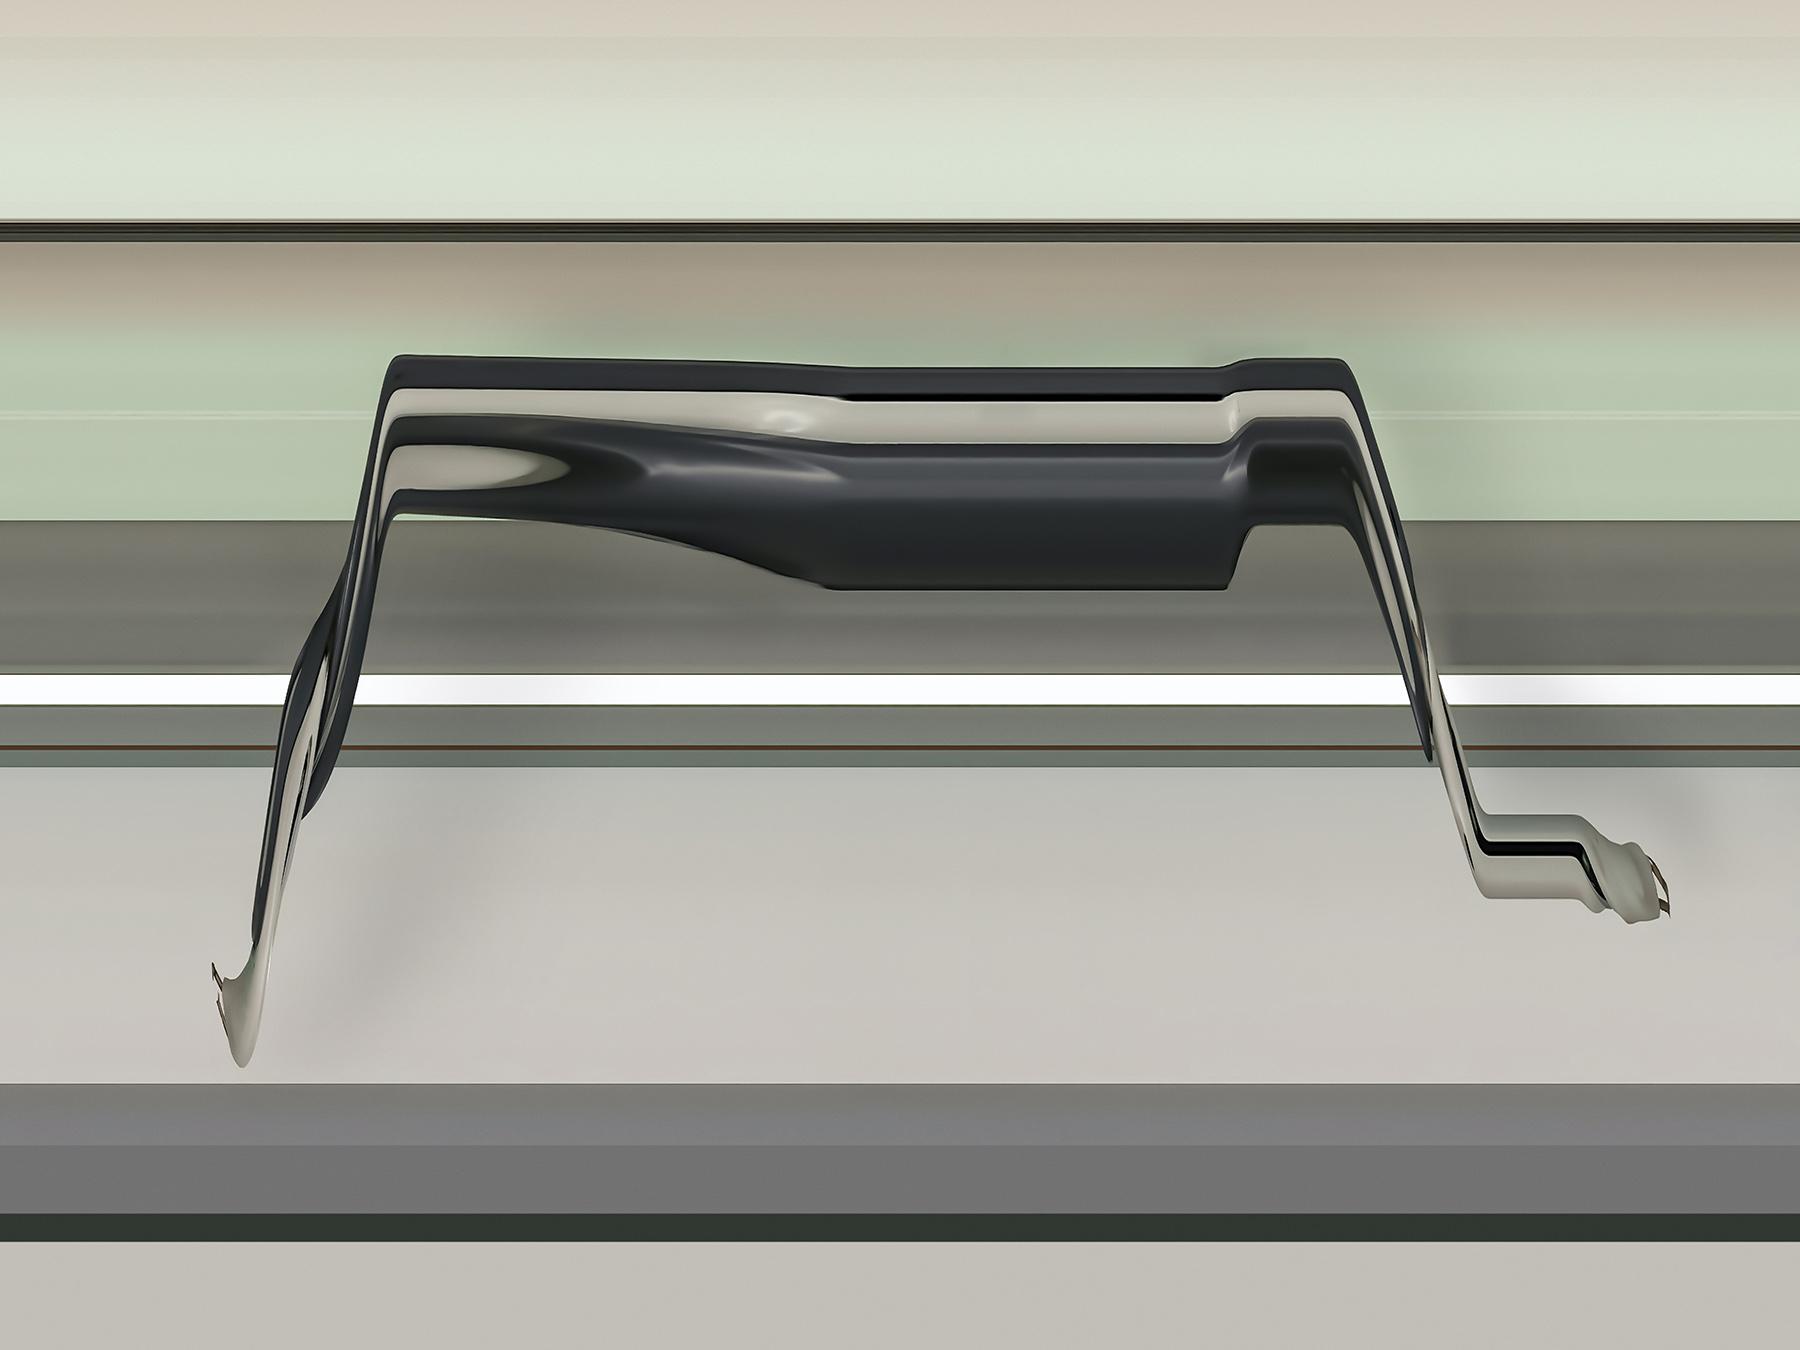 YuMi IRB 14000 12, 2020 30 x 40 cm (11.8 x 15.7 in.)